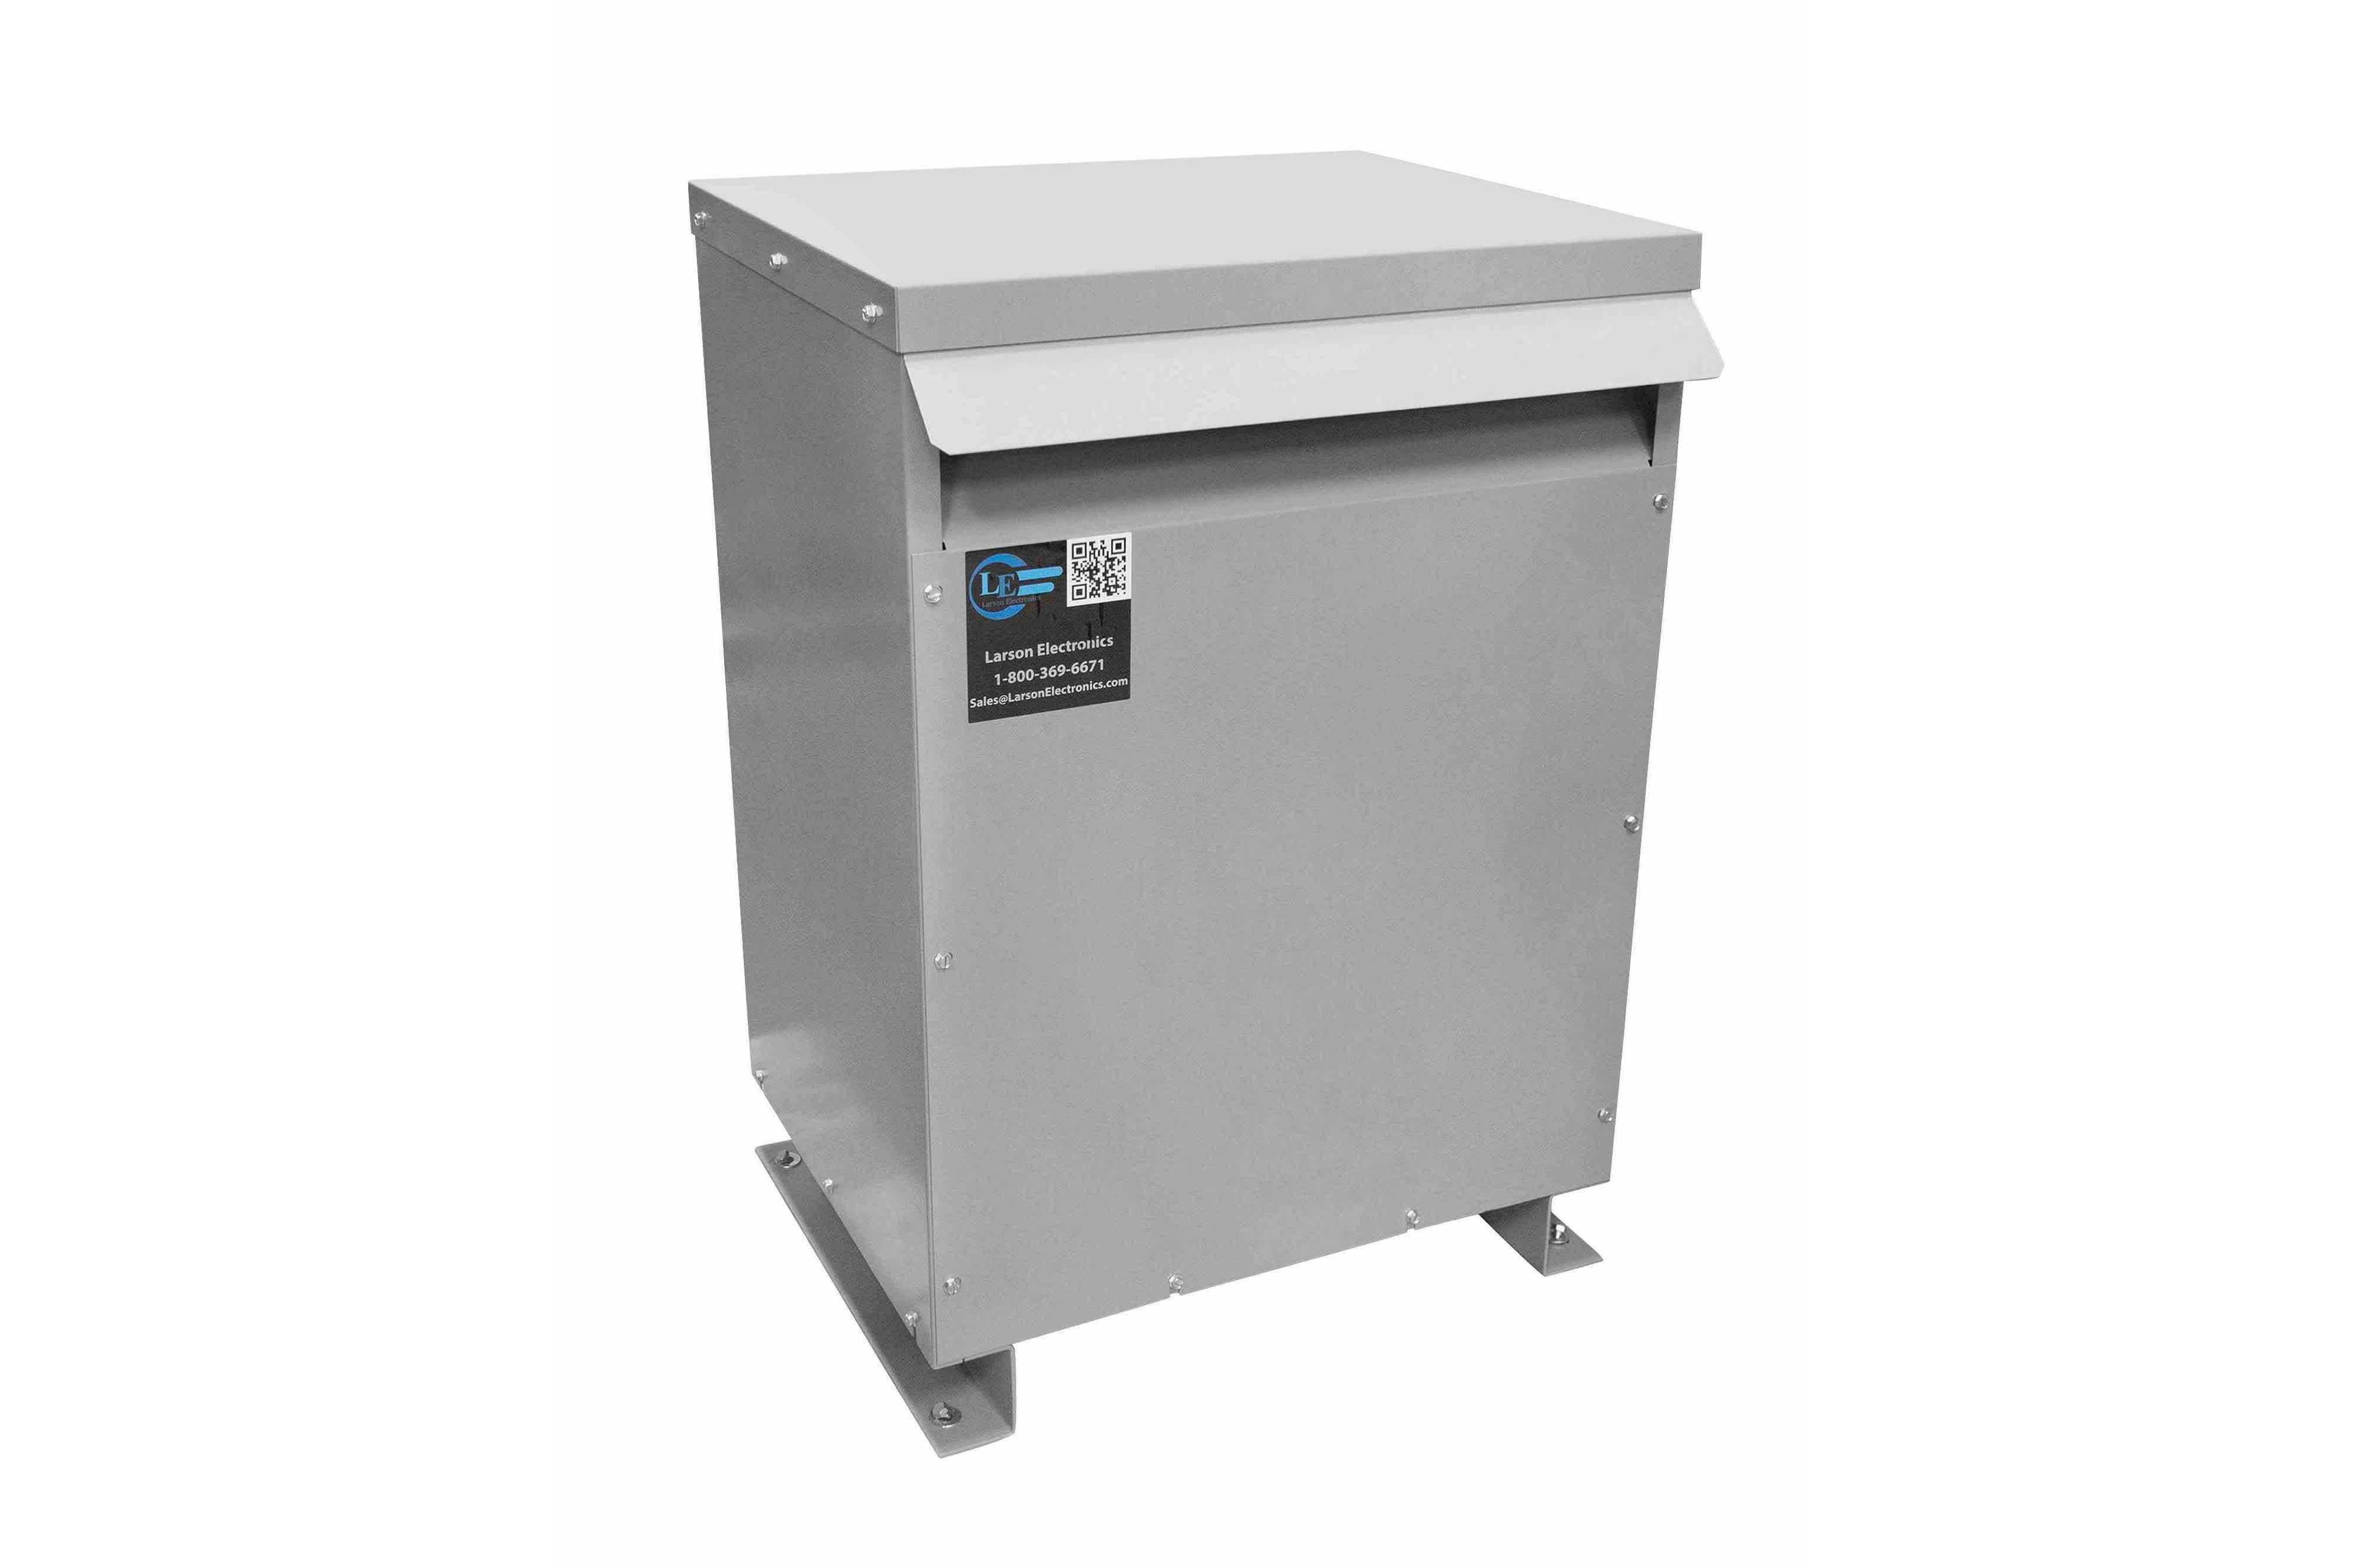 150 kVA 3PH DOE Transformer, 480V Delta Primary, 380Y/220 Wye-N Secondary, N3R, Ventilated, 60 Hz